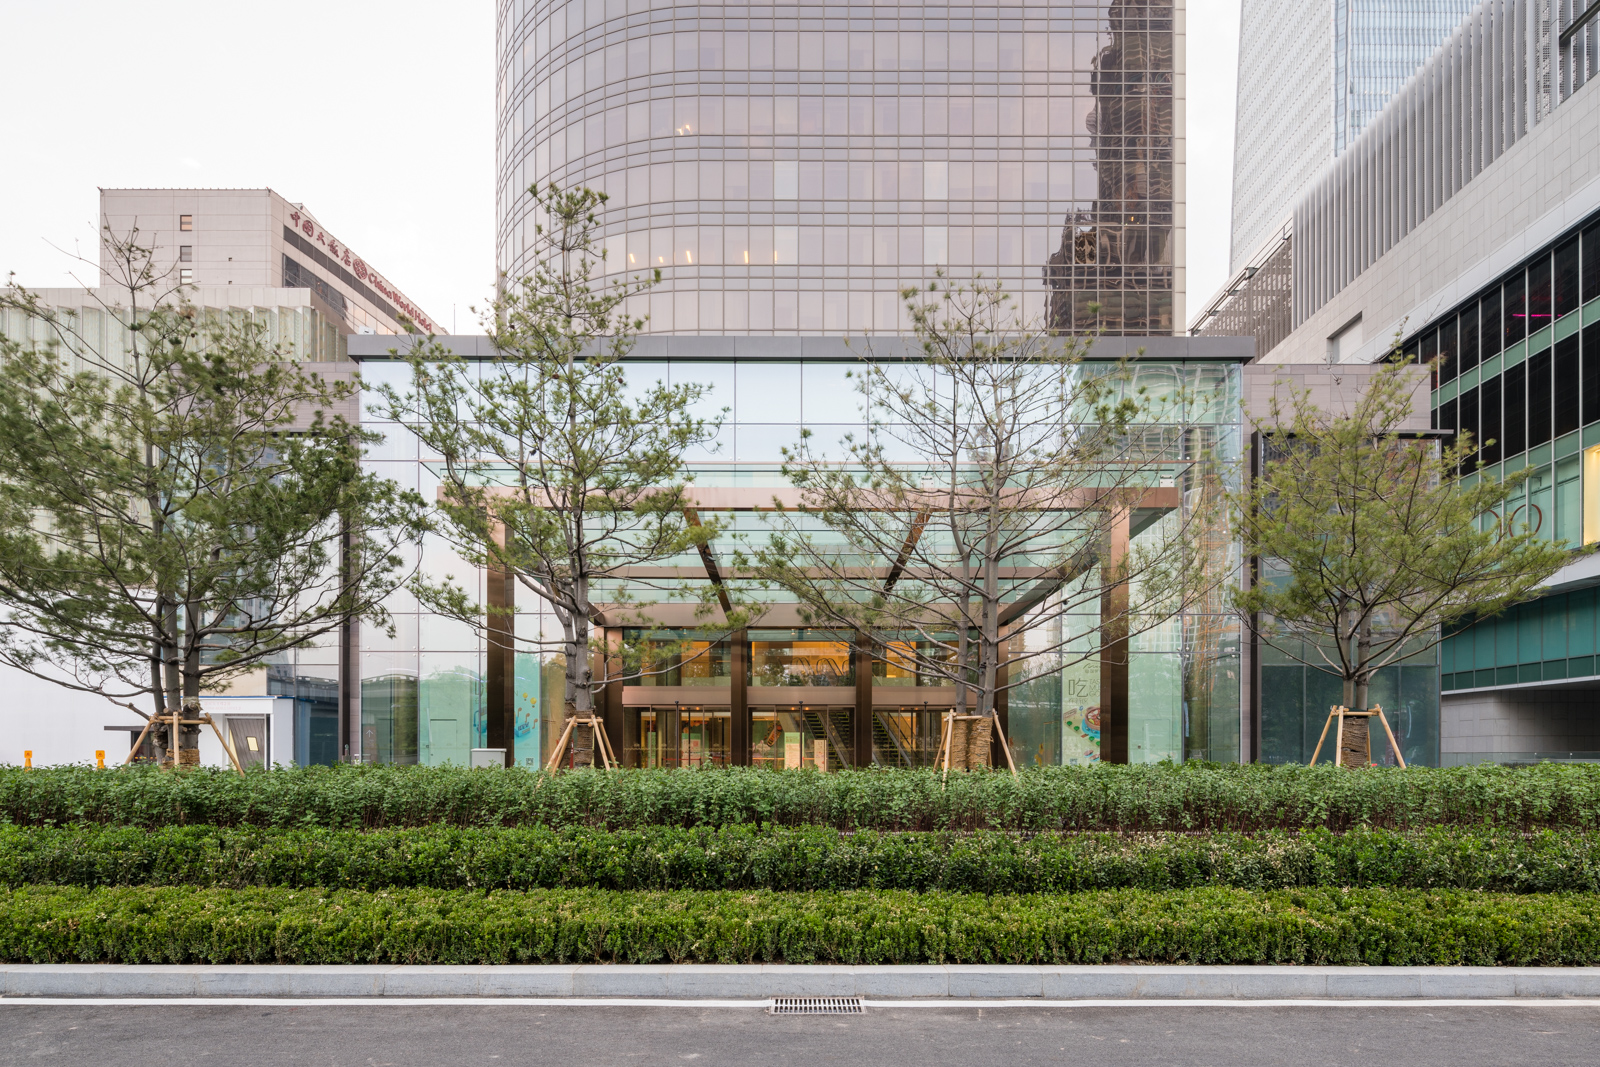 China World Mall Entrance